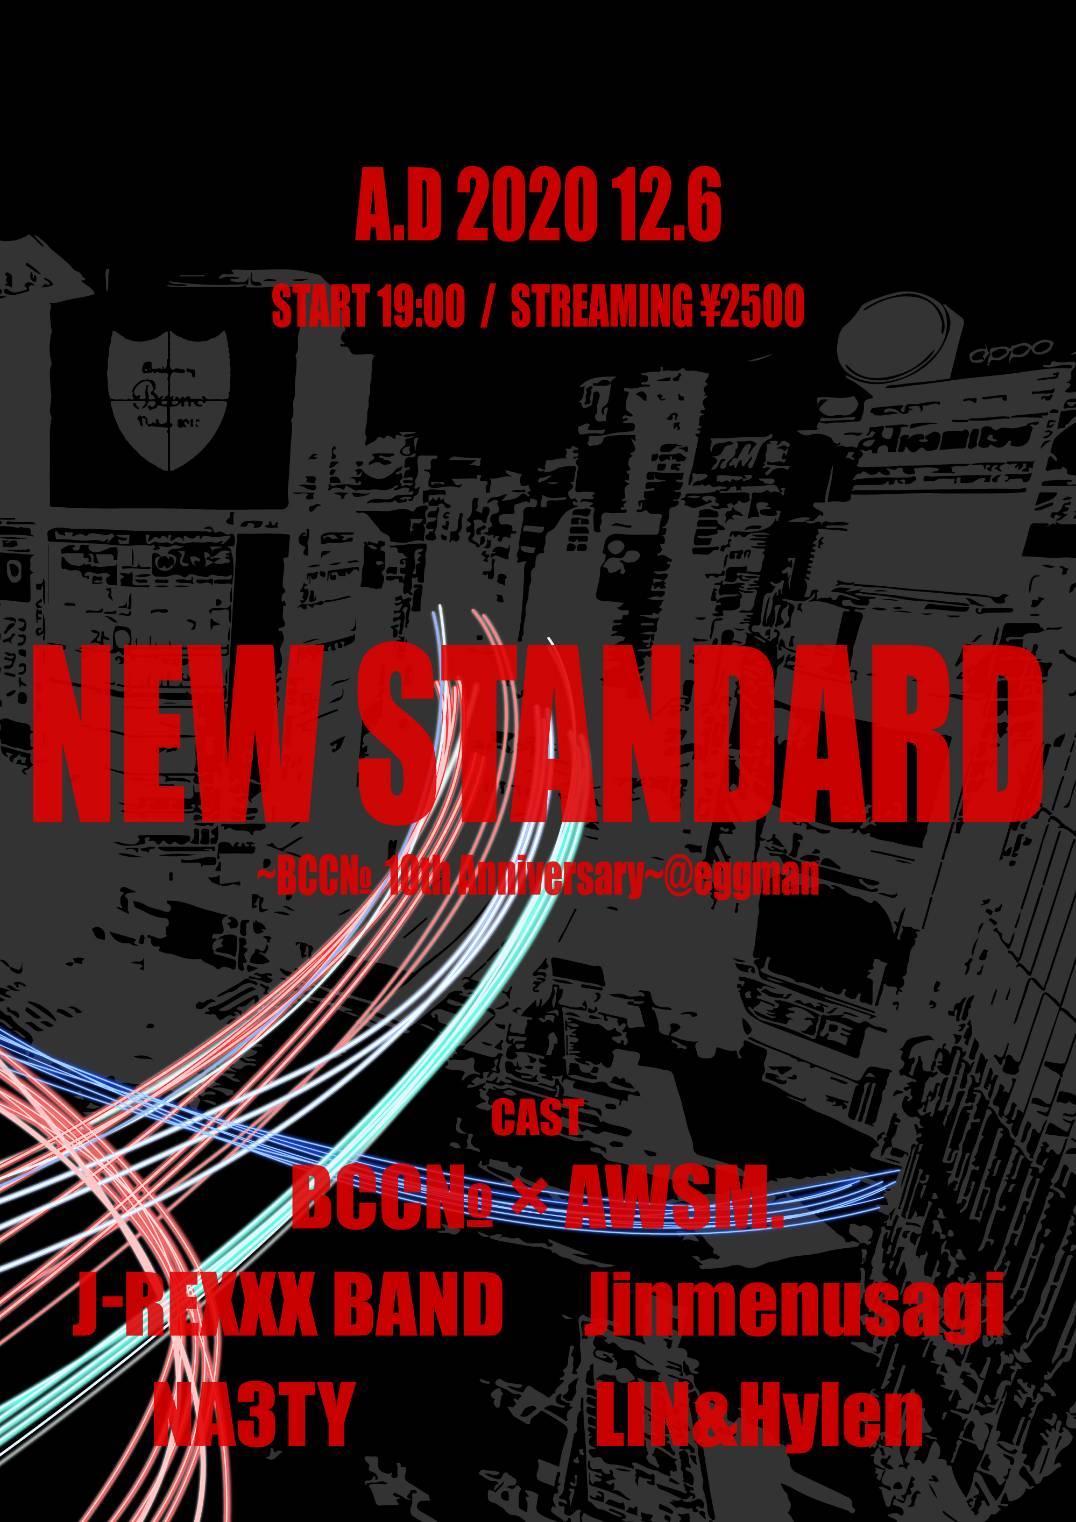 NEW STANDARD〜BCC№ 10th Anniversary〜@eggman